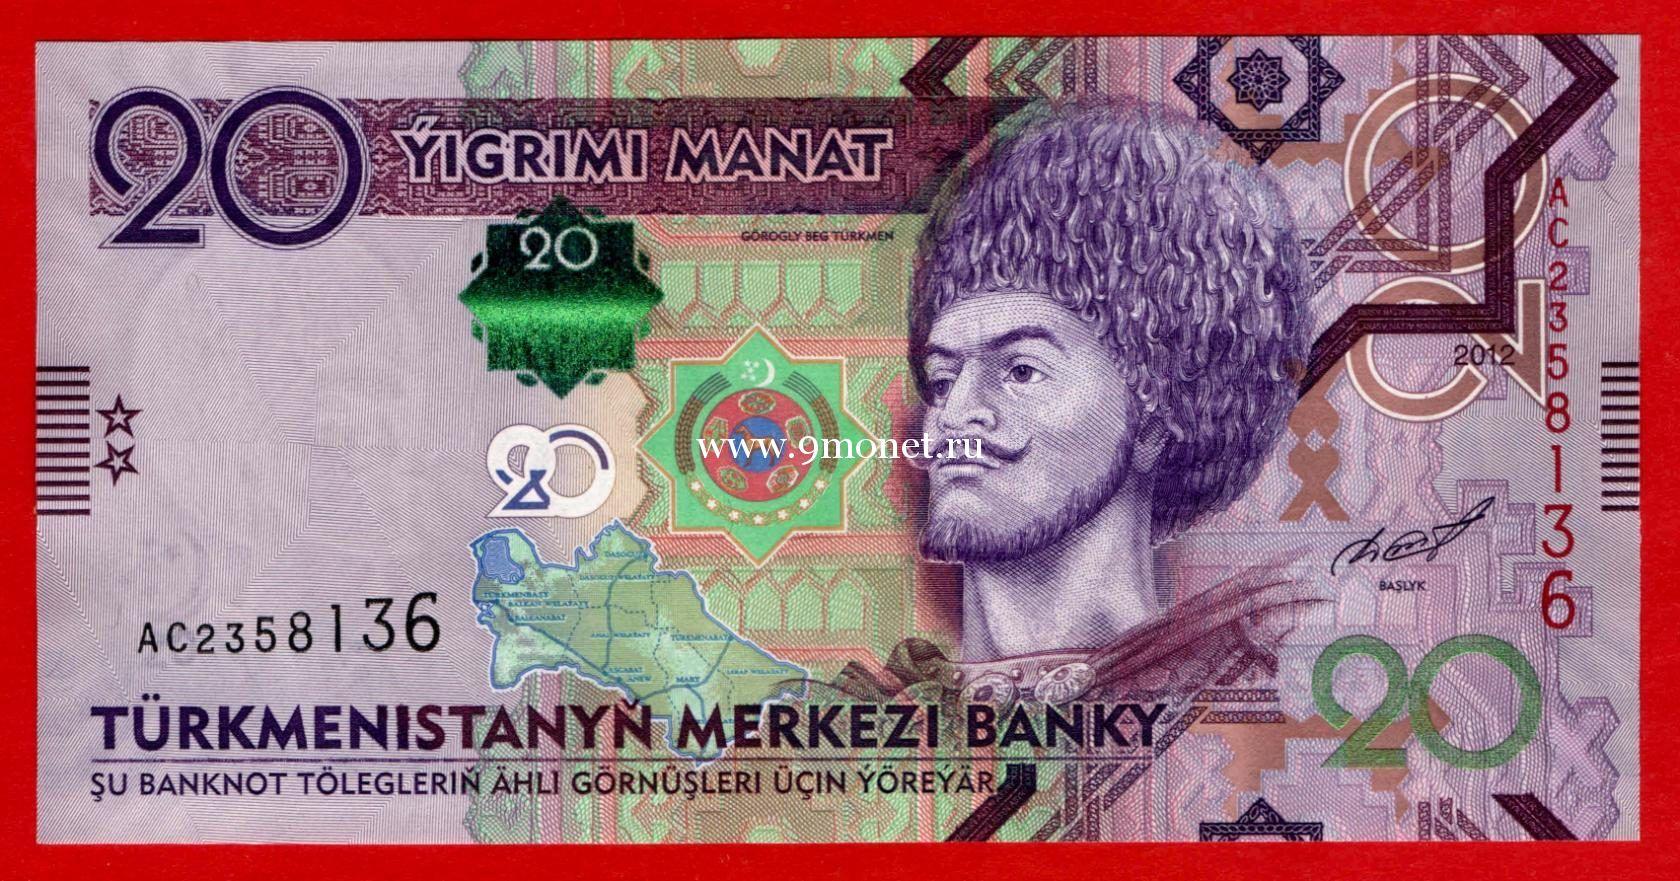 2012 год. Туркменистан. Банкнота 20 манат. UNC